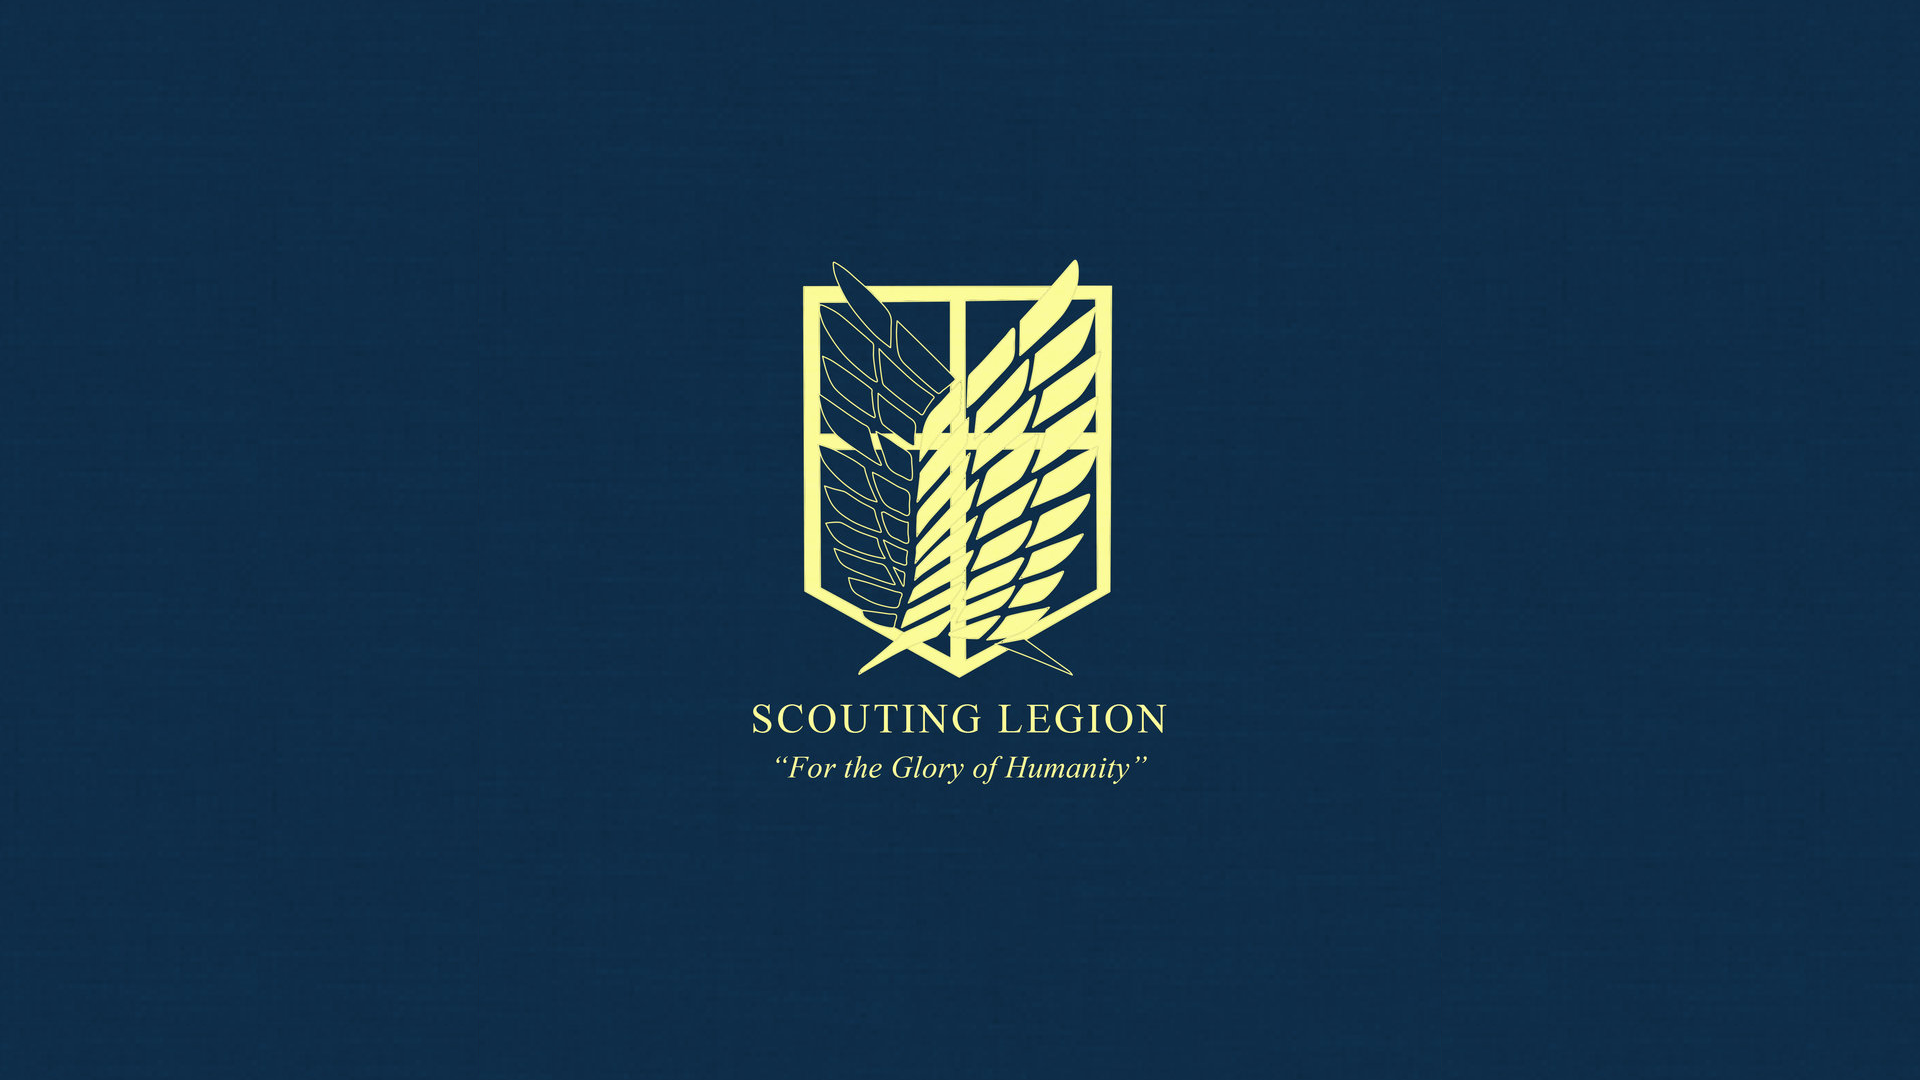 Attack on Titan Scouting Legion Wallpaper by Imxset21 1920x1080